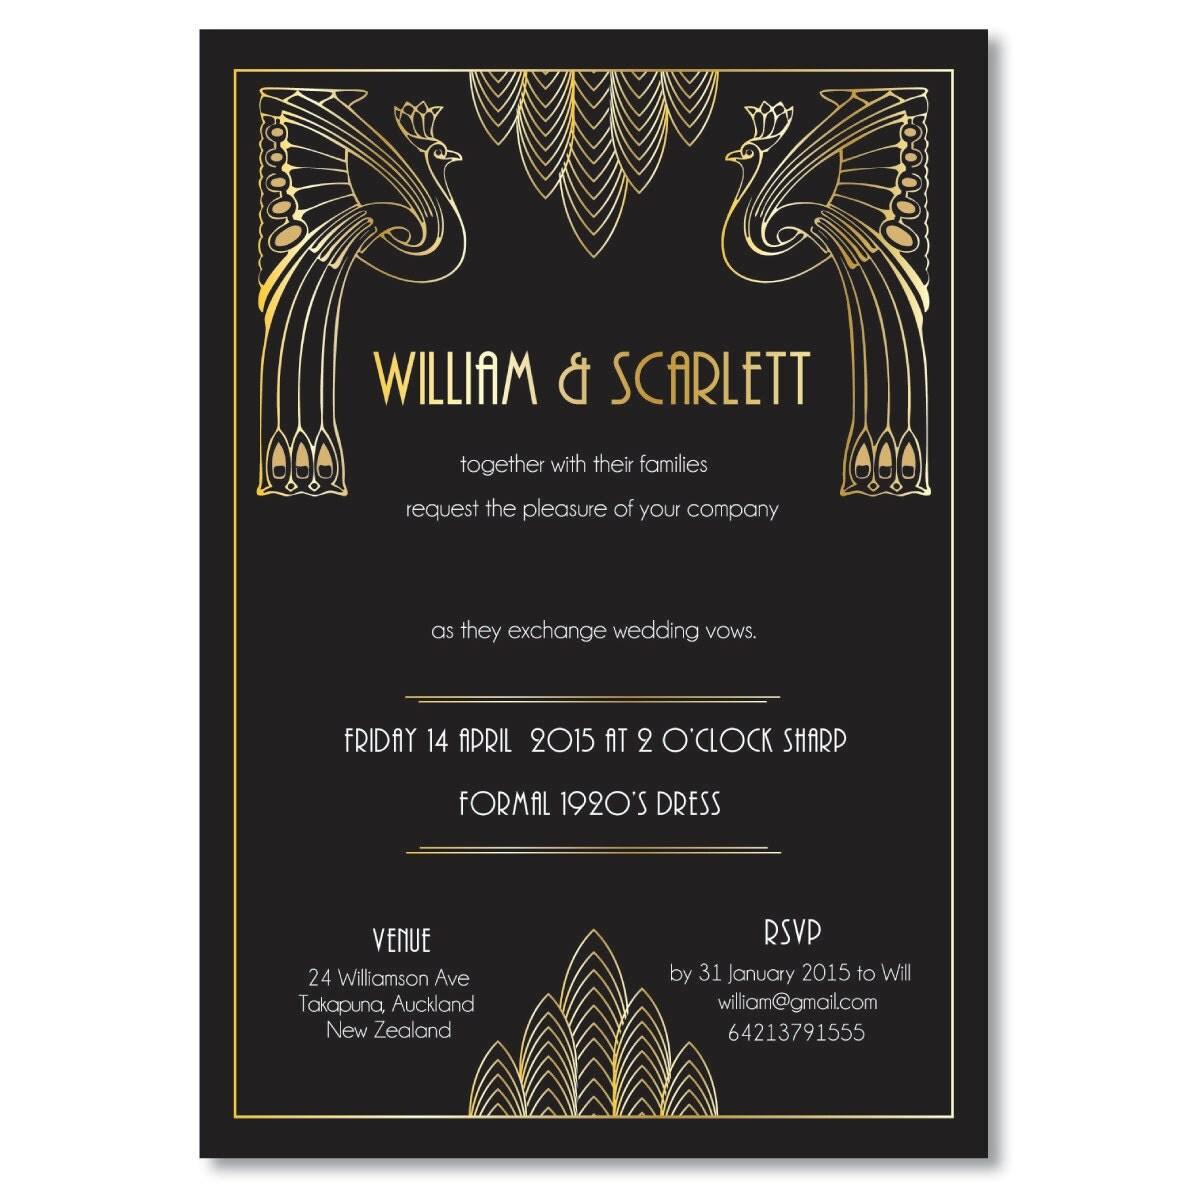 Great Gatsby Wedding Invites: Great Gatsby Wedding Invitation Roaring 20's Party Art